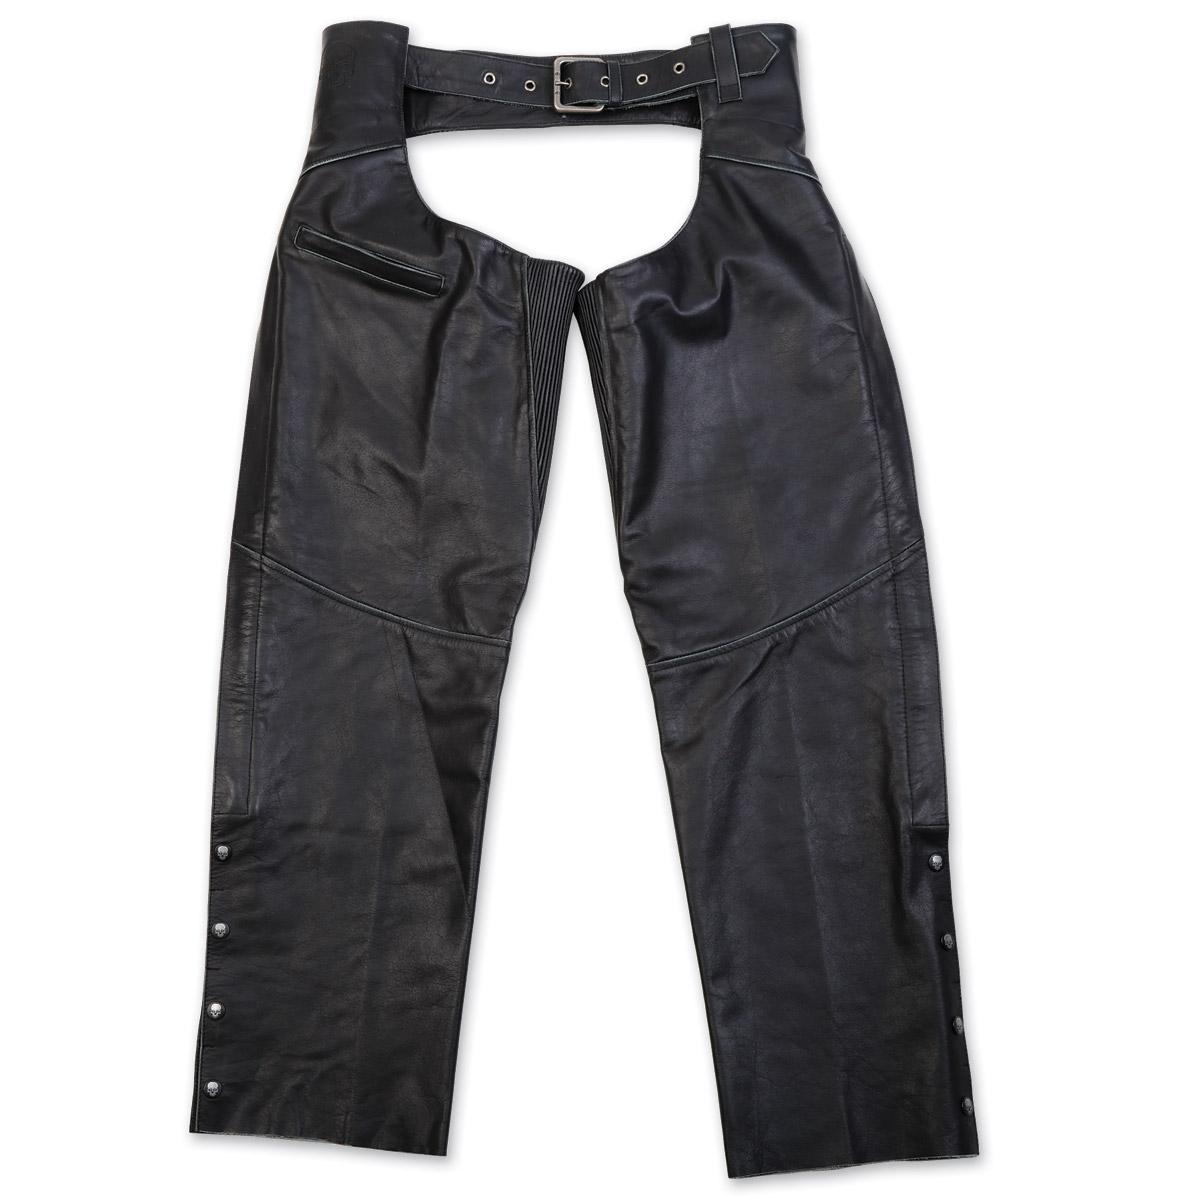 Black Brand Men's Torque Black Leather Chaps